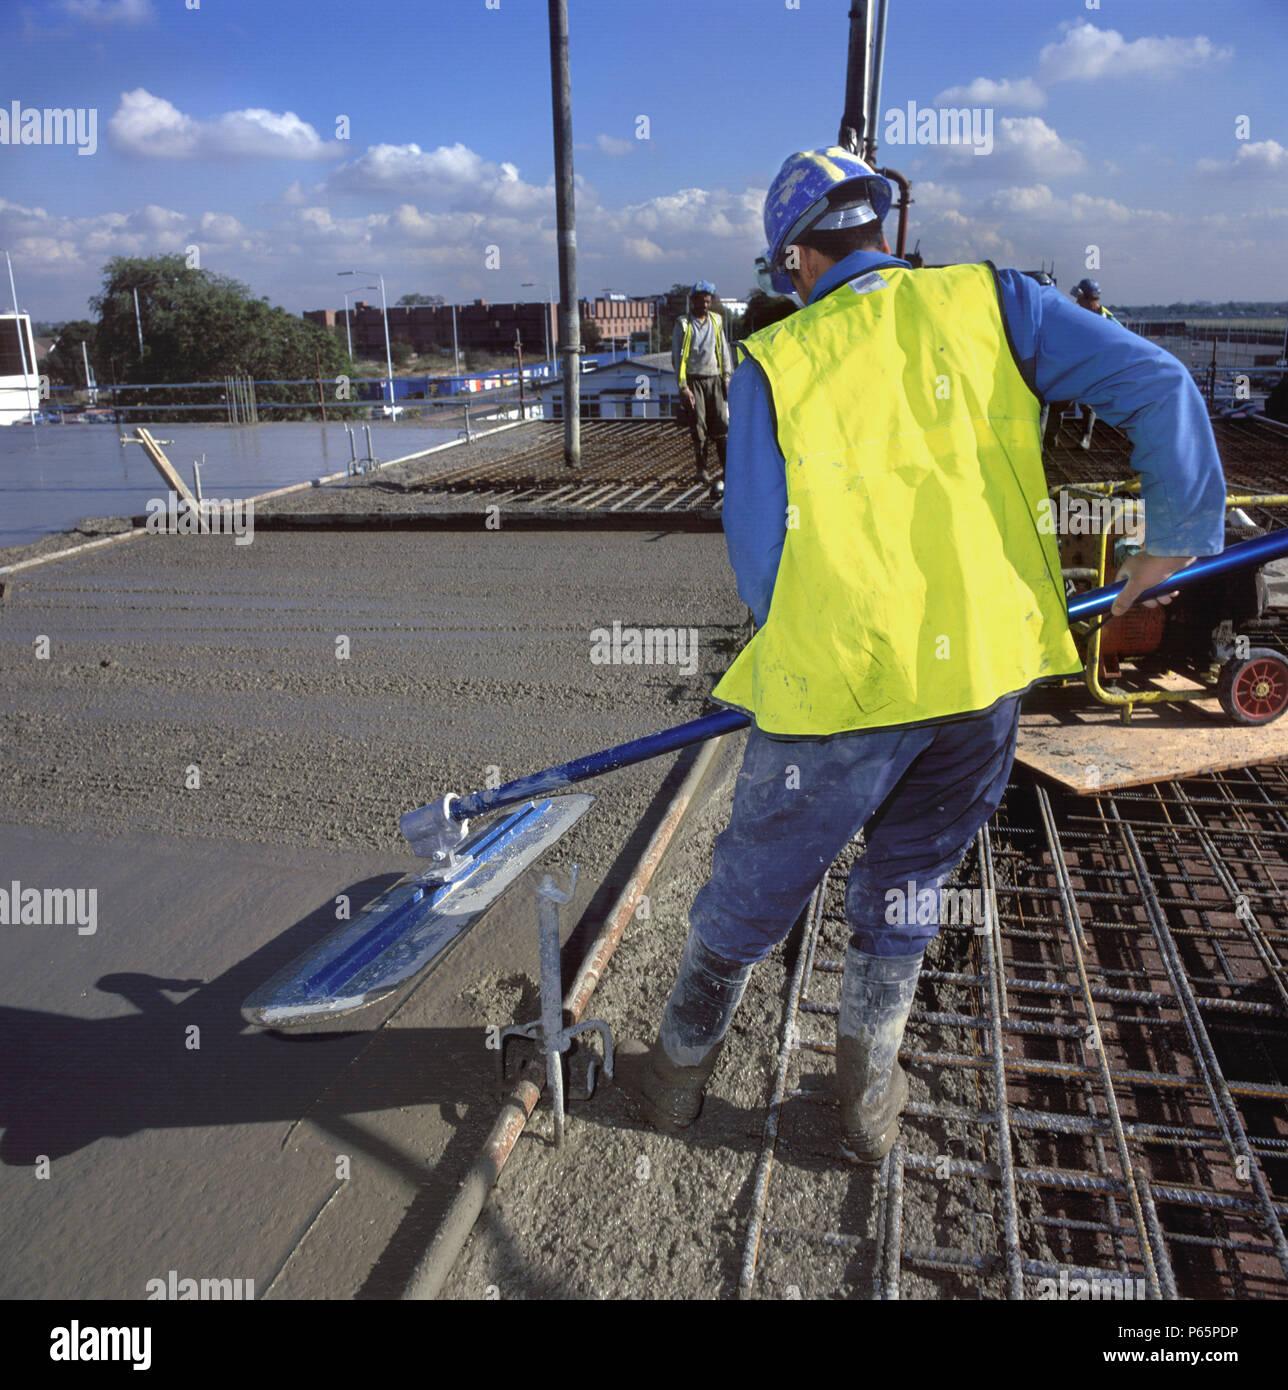 Screeding in situ reinforced concrete slab Stock Photo: 210339746 - Alamy